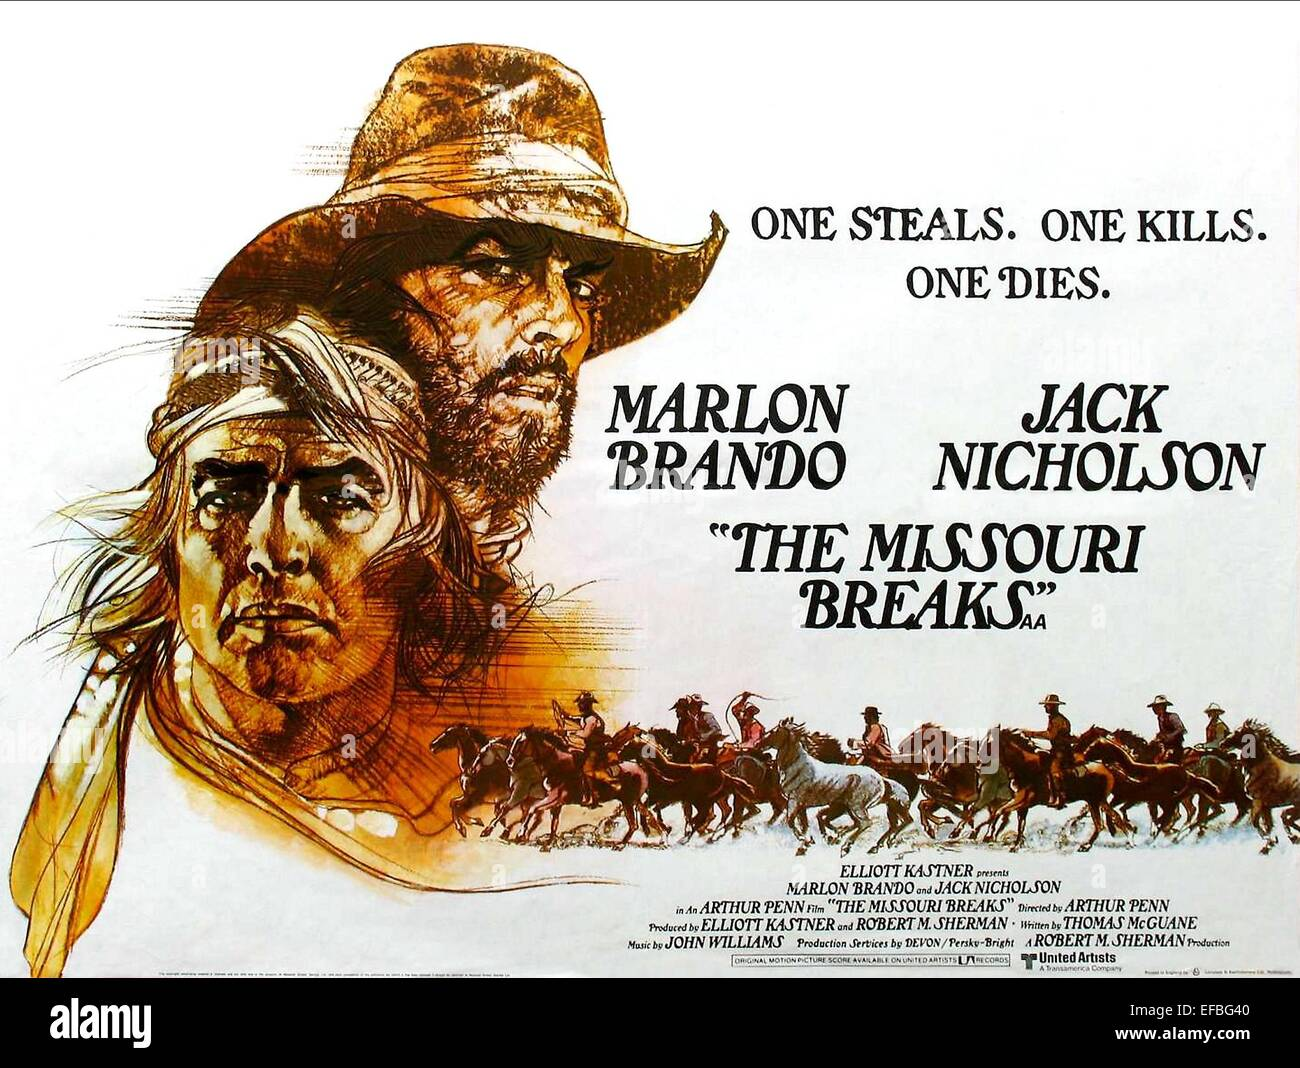 MARLON BRANDO, JACK NICHOLSON MOVIE POSTER, THE MISSOURI BREAKS, 1976 - Stock Image